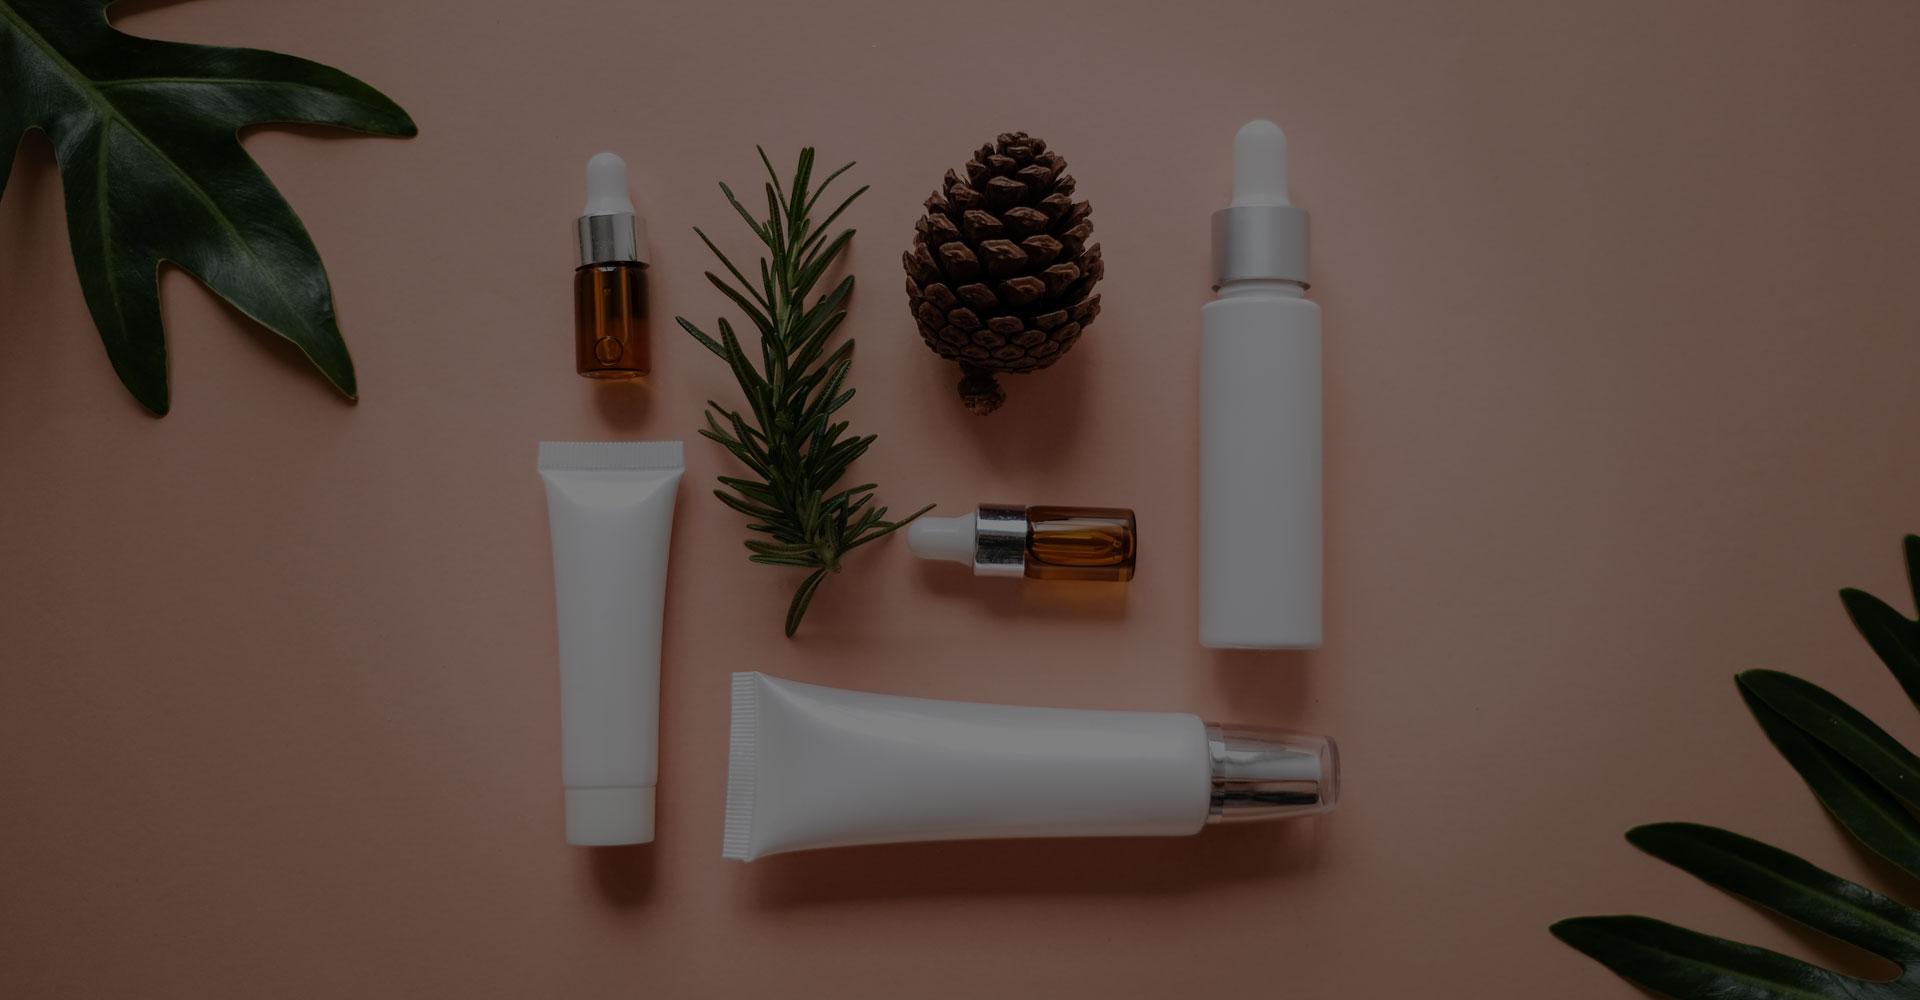 Le bio cosmetique naturel et equitable